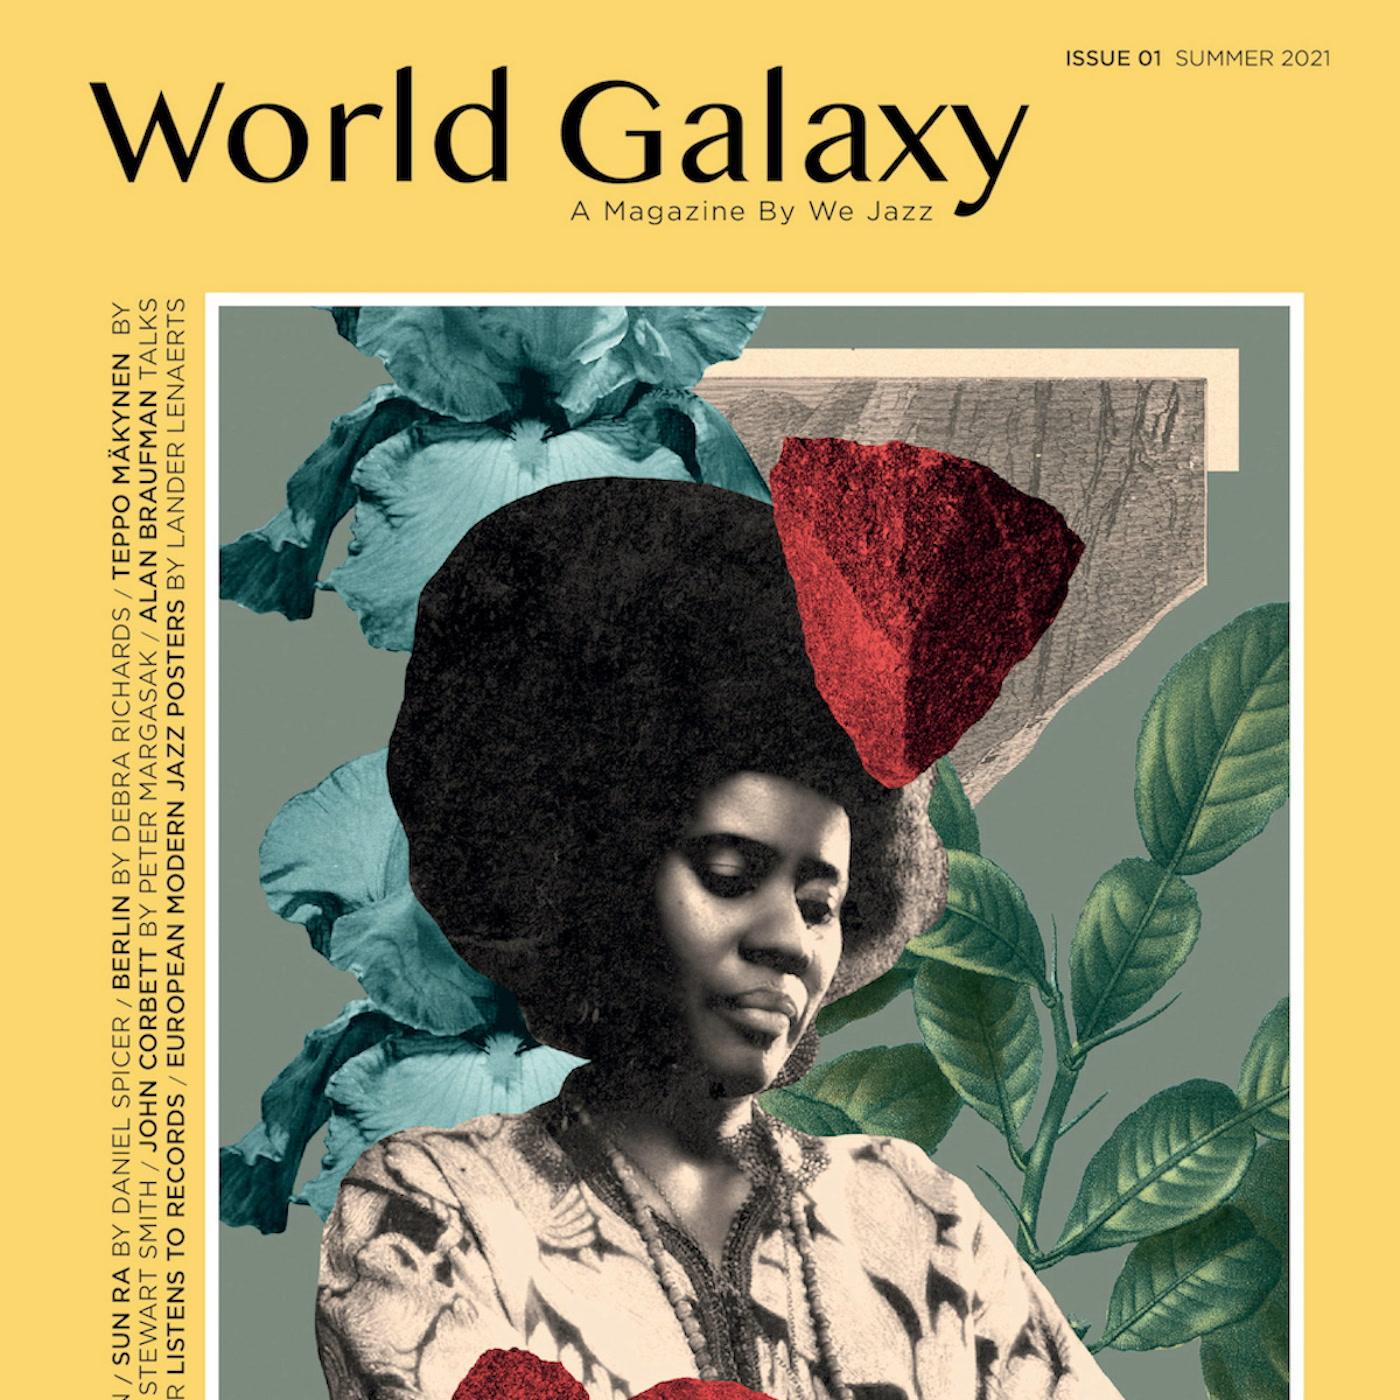 We Jazz Magazine – World Galaxy (We Jazz)